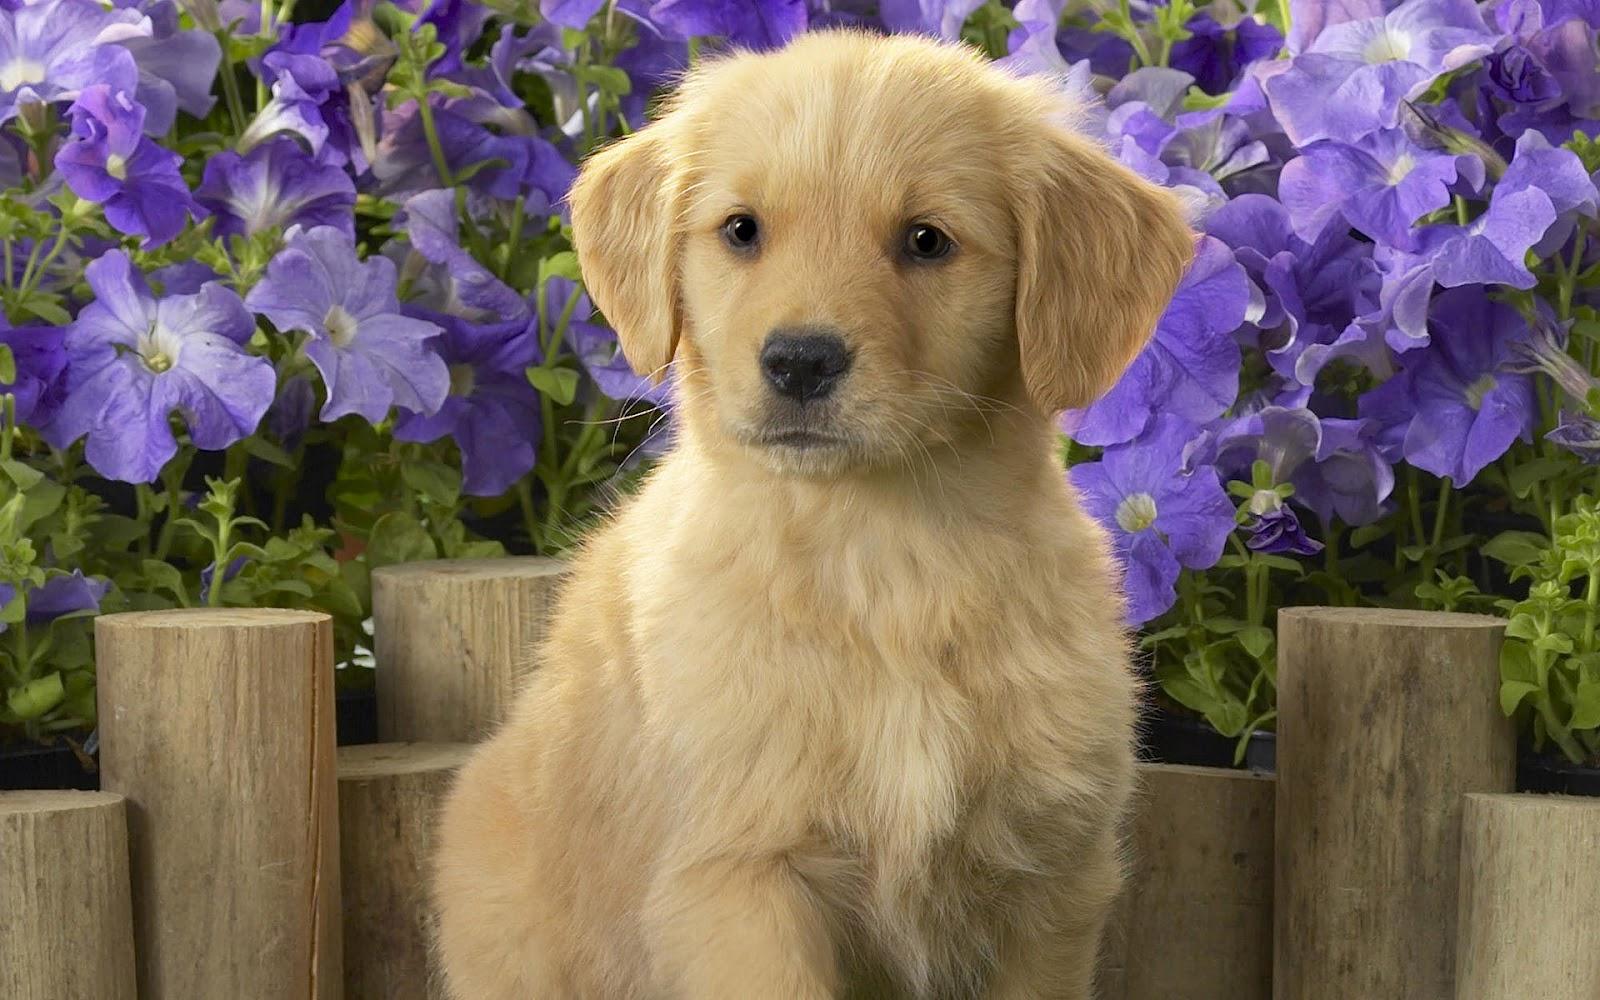 48] Cute Puppy Wallpaper HD on WallpaperSafari 1600x1000